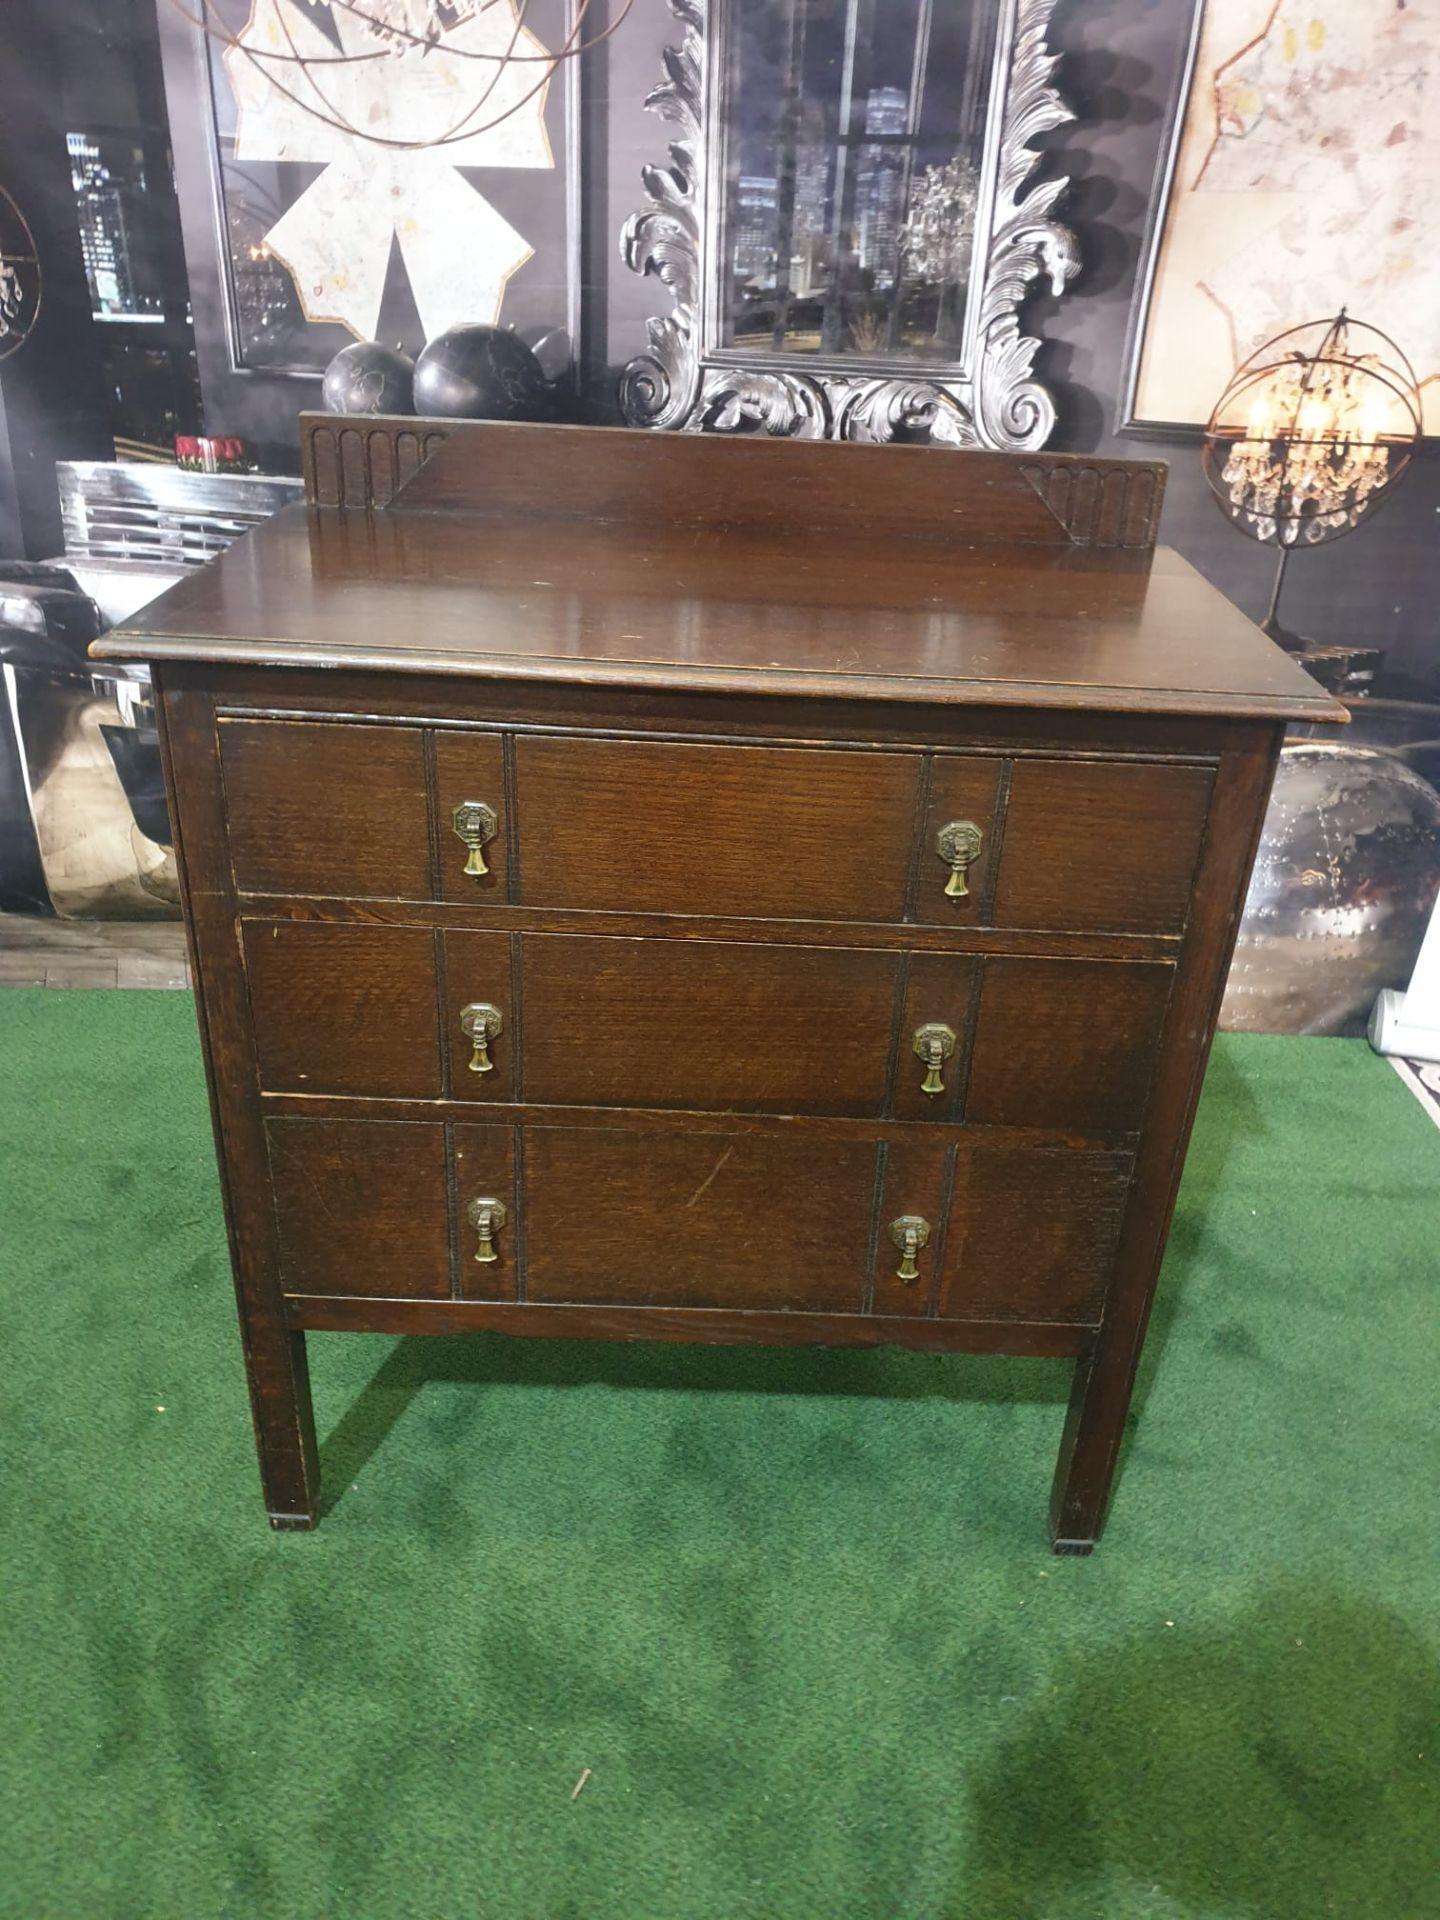 Late Georgian Mahogany Chest Of Drawers three Drawer chest 84W x 46D x 95H